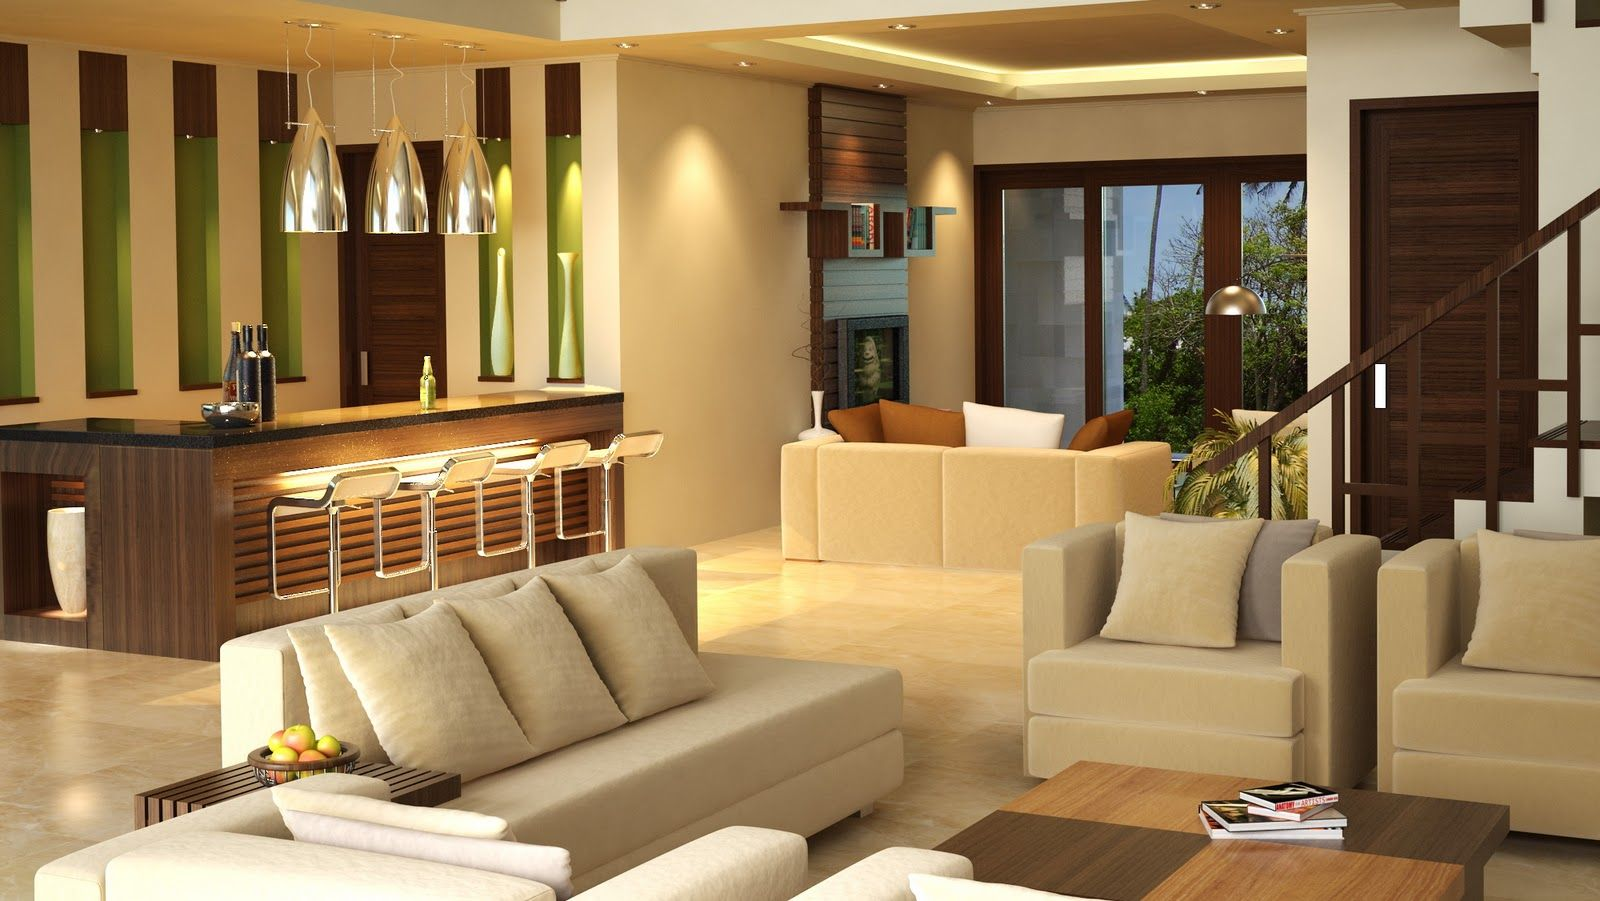 Contoh Desain Interior Rumah Minimalis Desain Interior Interior Rumah